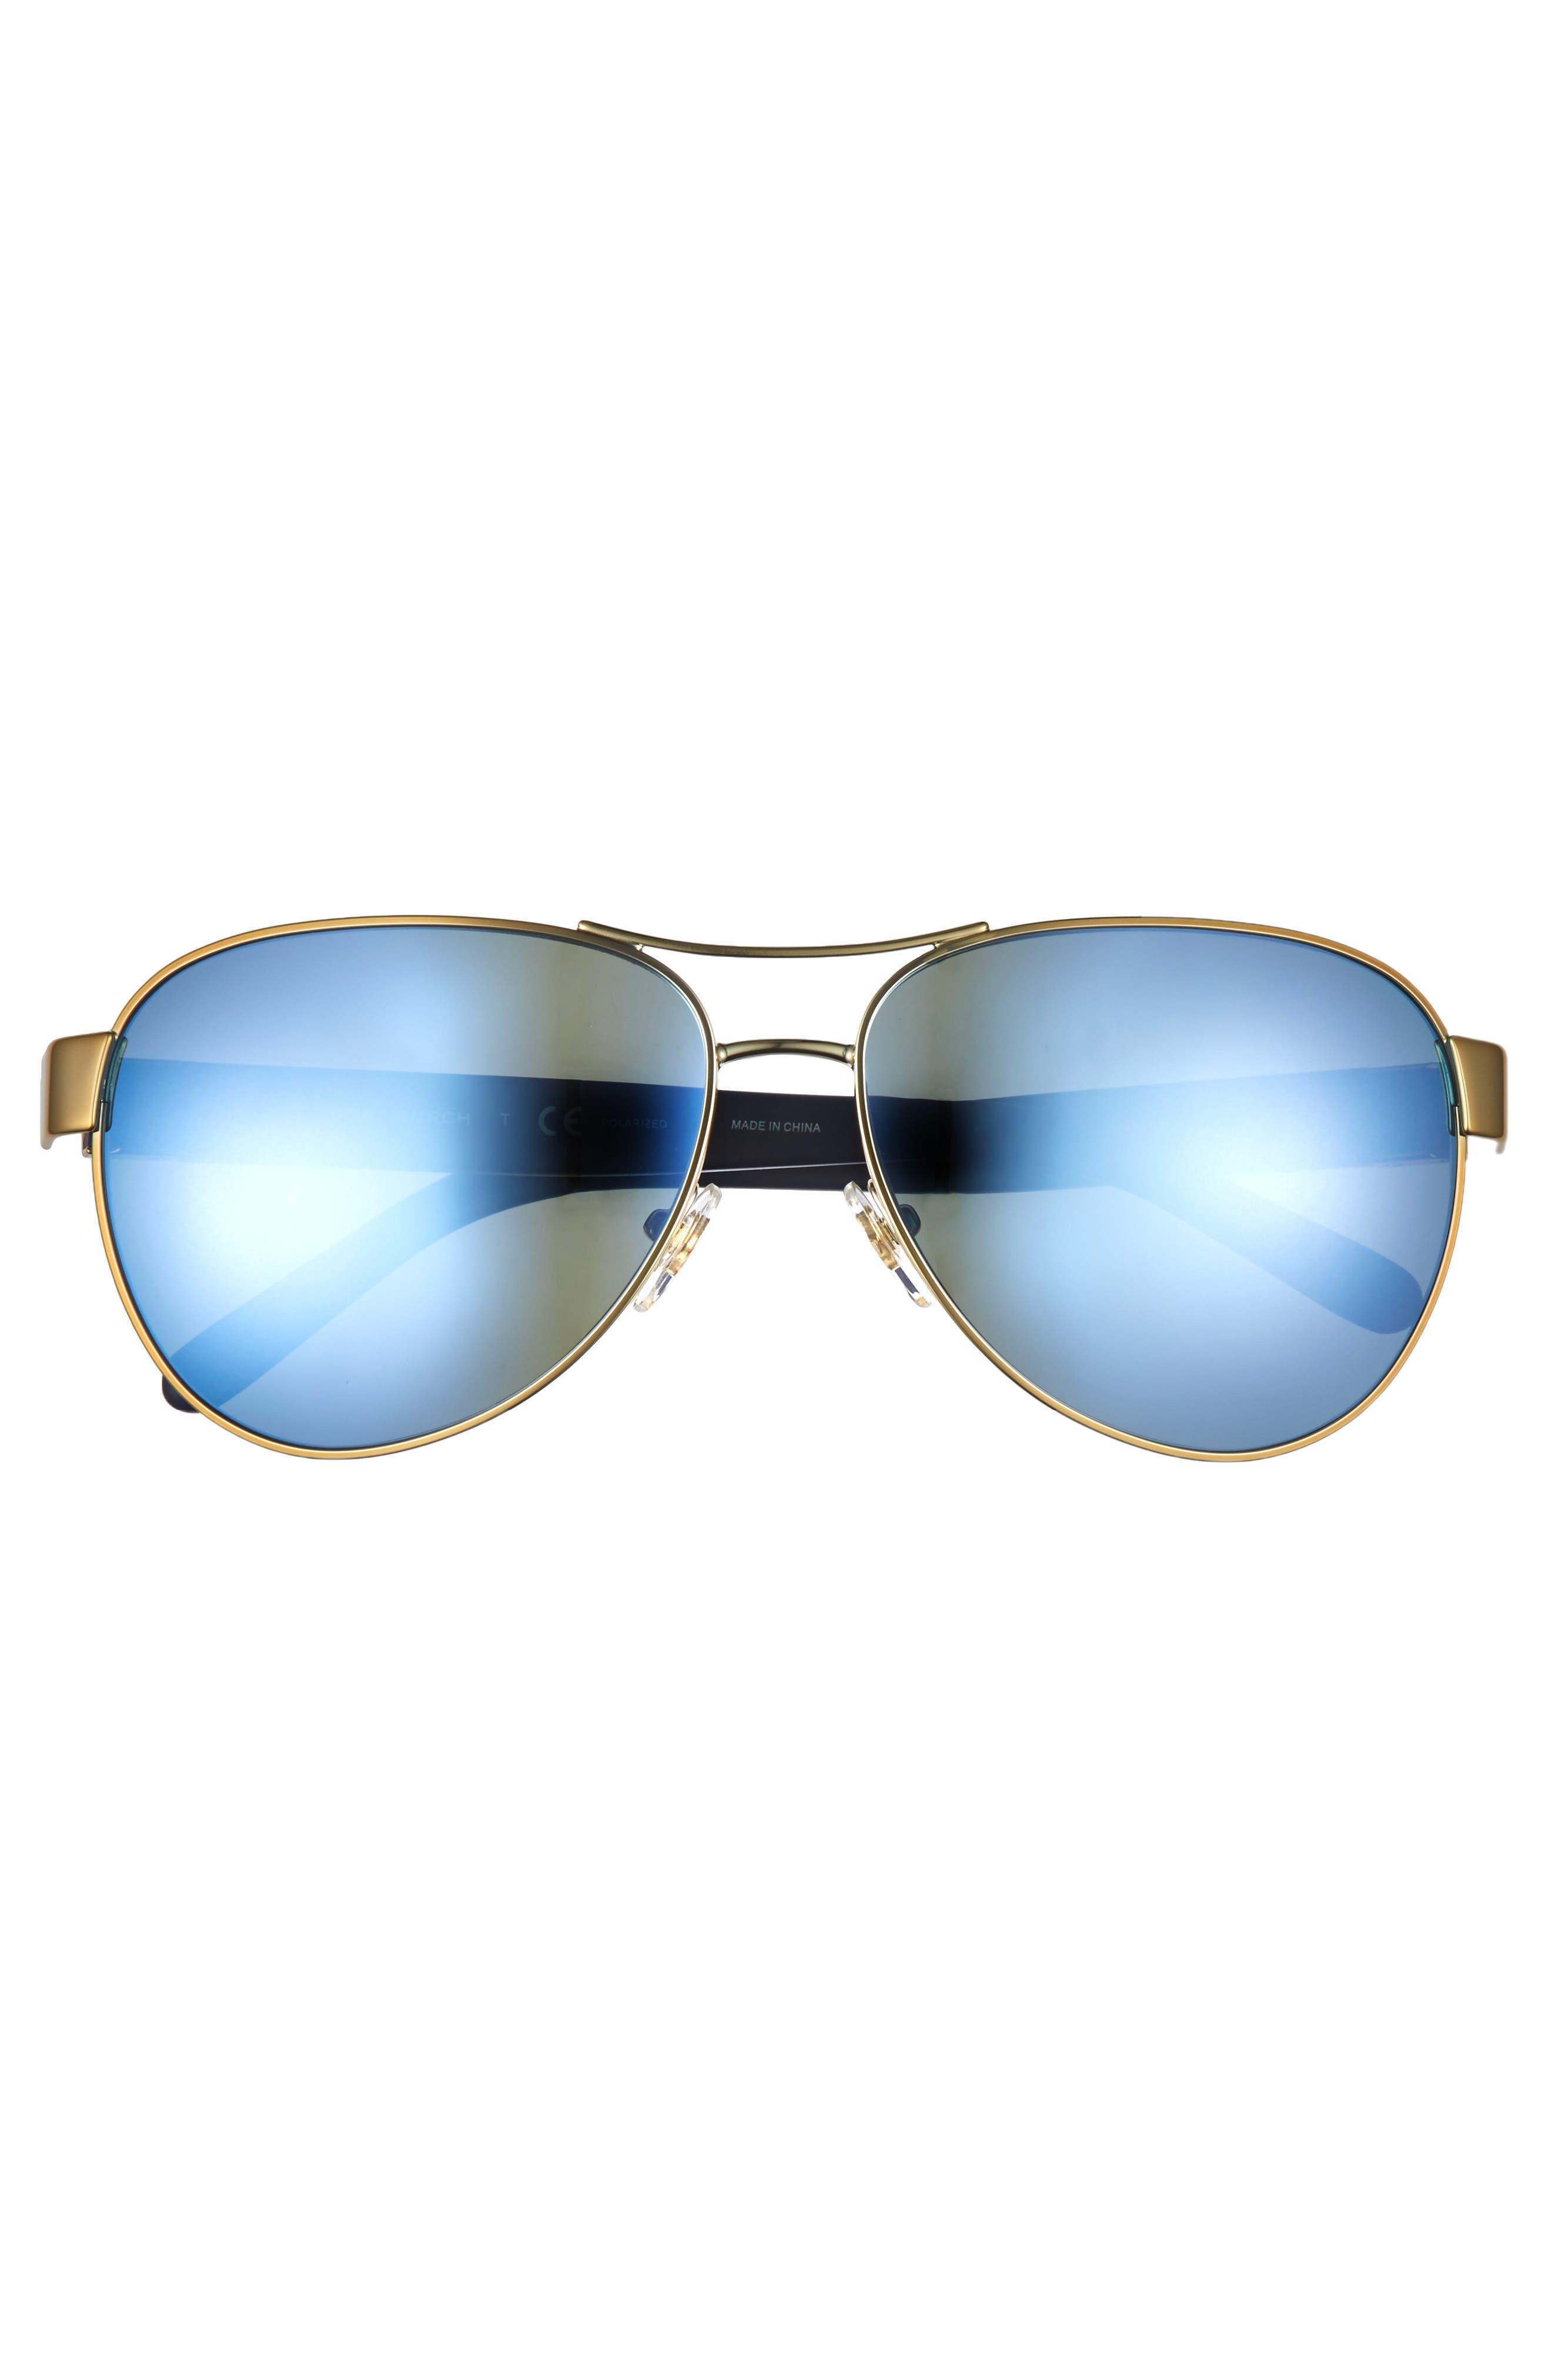 60mm Polarized Aviator Sunglasses,                             Alternate thumbnail 3, color,                             Gold